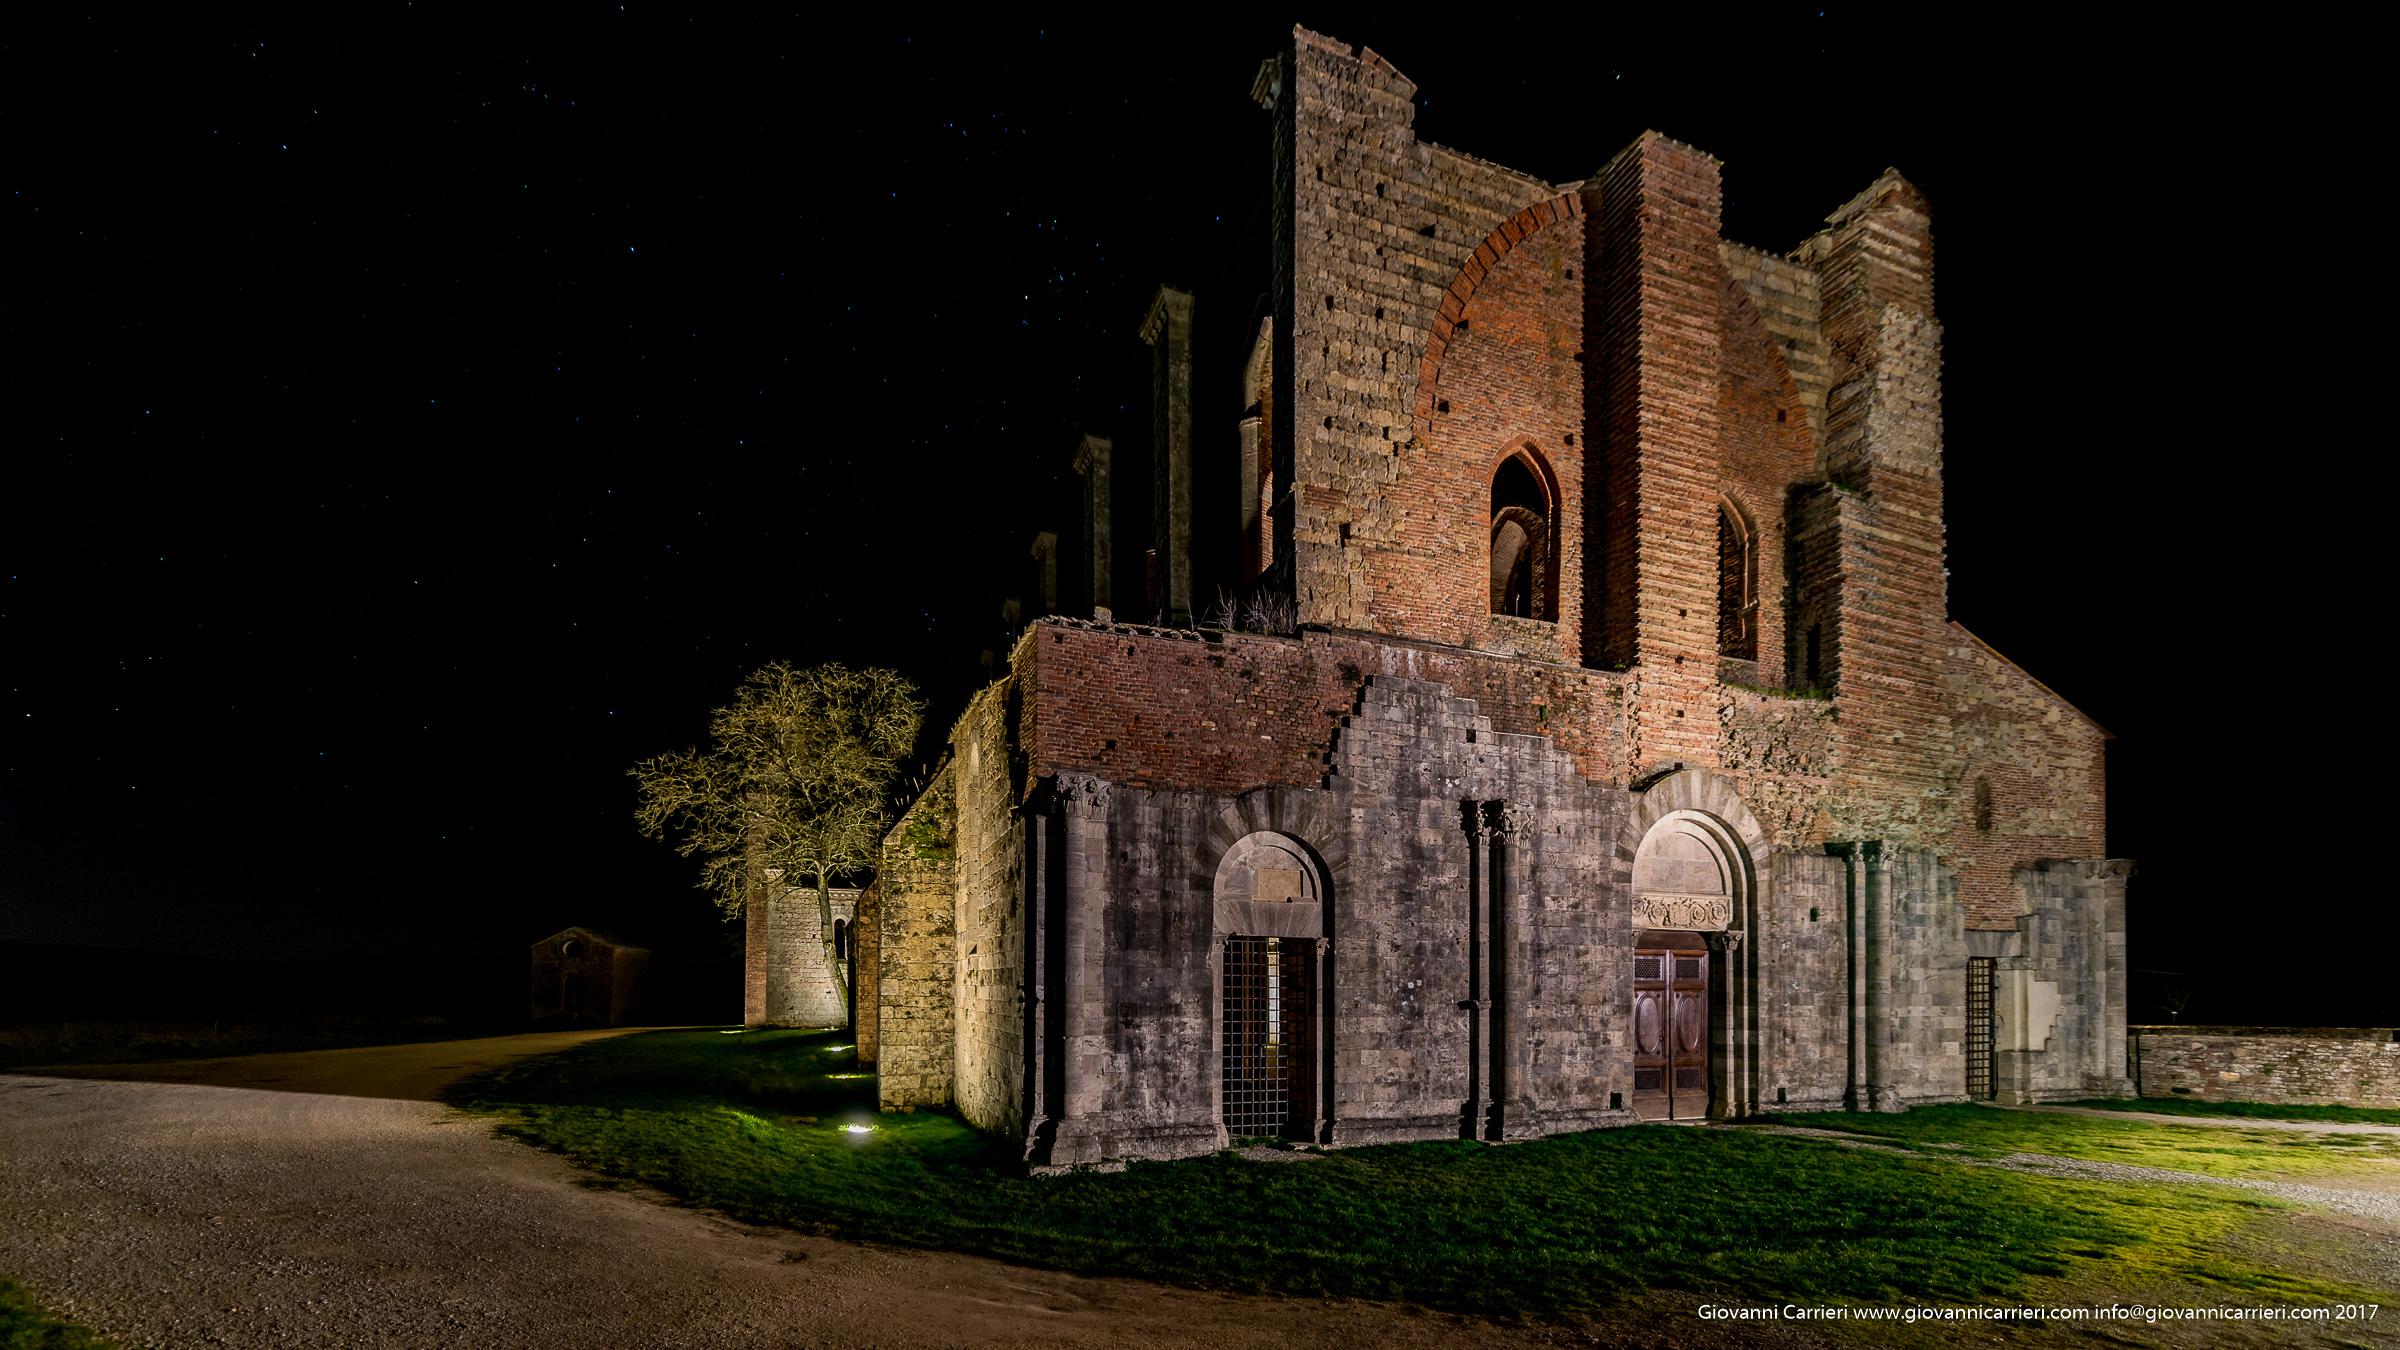 Night view of San Galgano Abbey by night